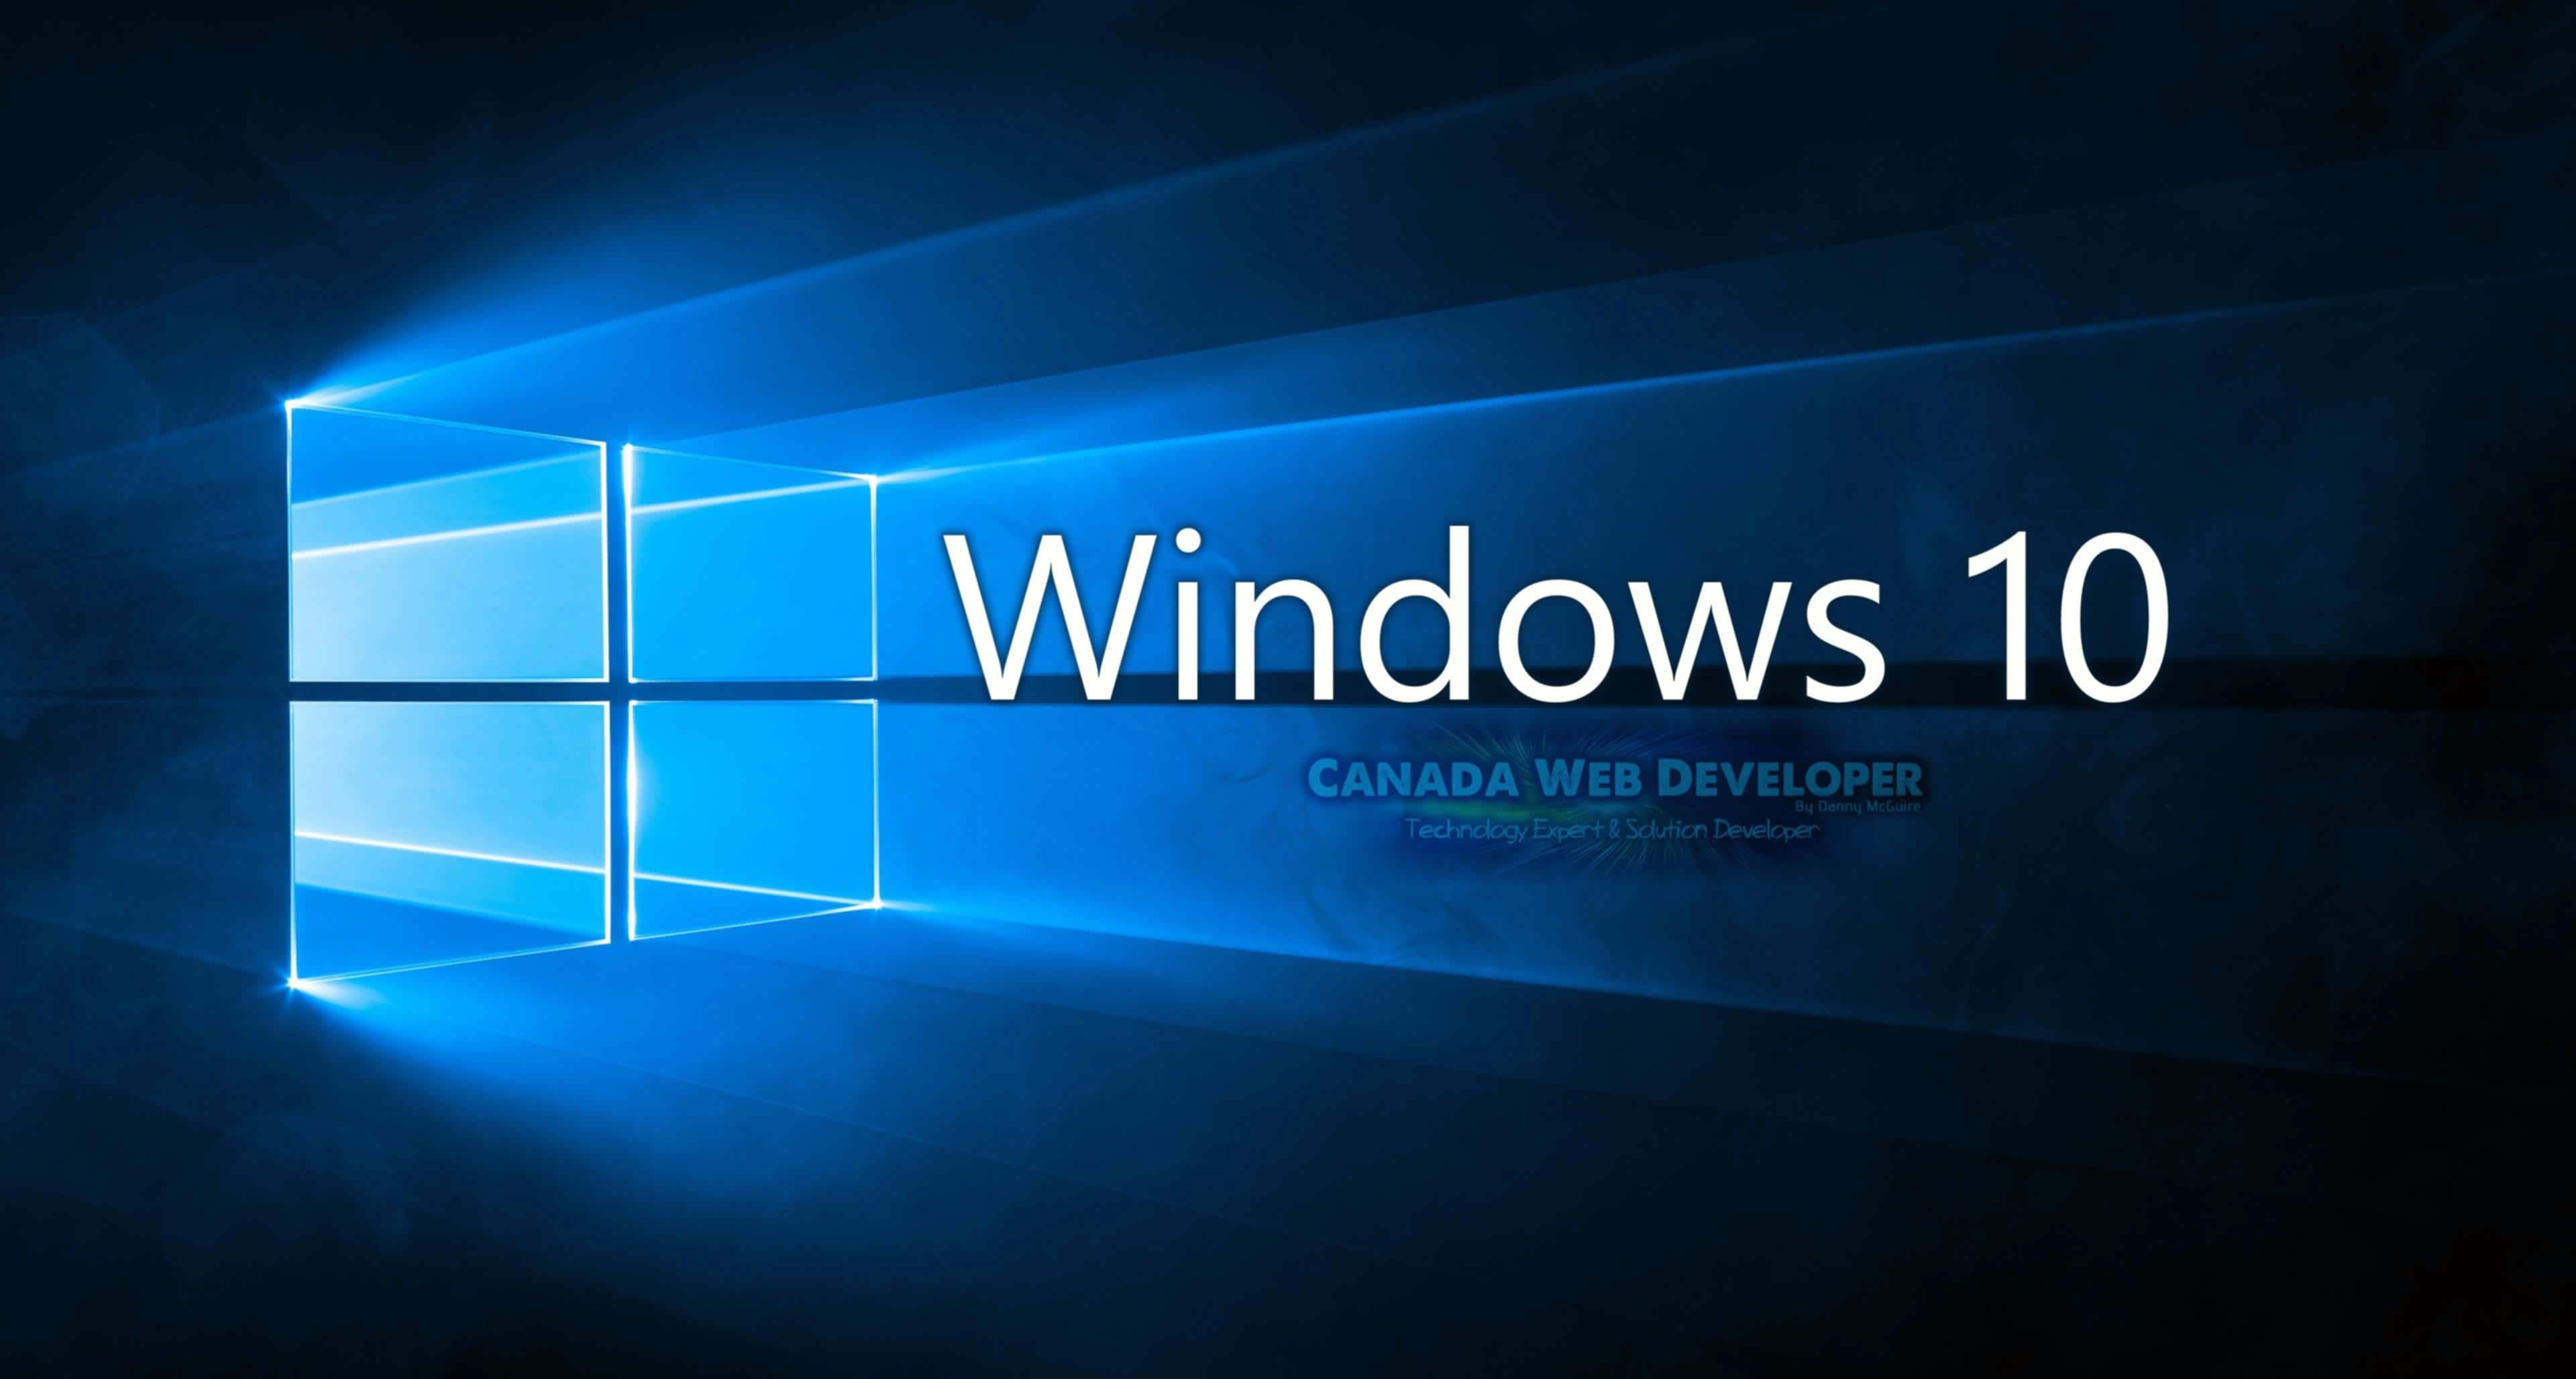 Dell 4k Windows 1 0 Wallpapers Top Free Dell 4k Windows